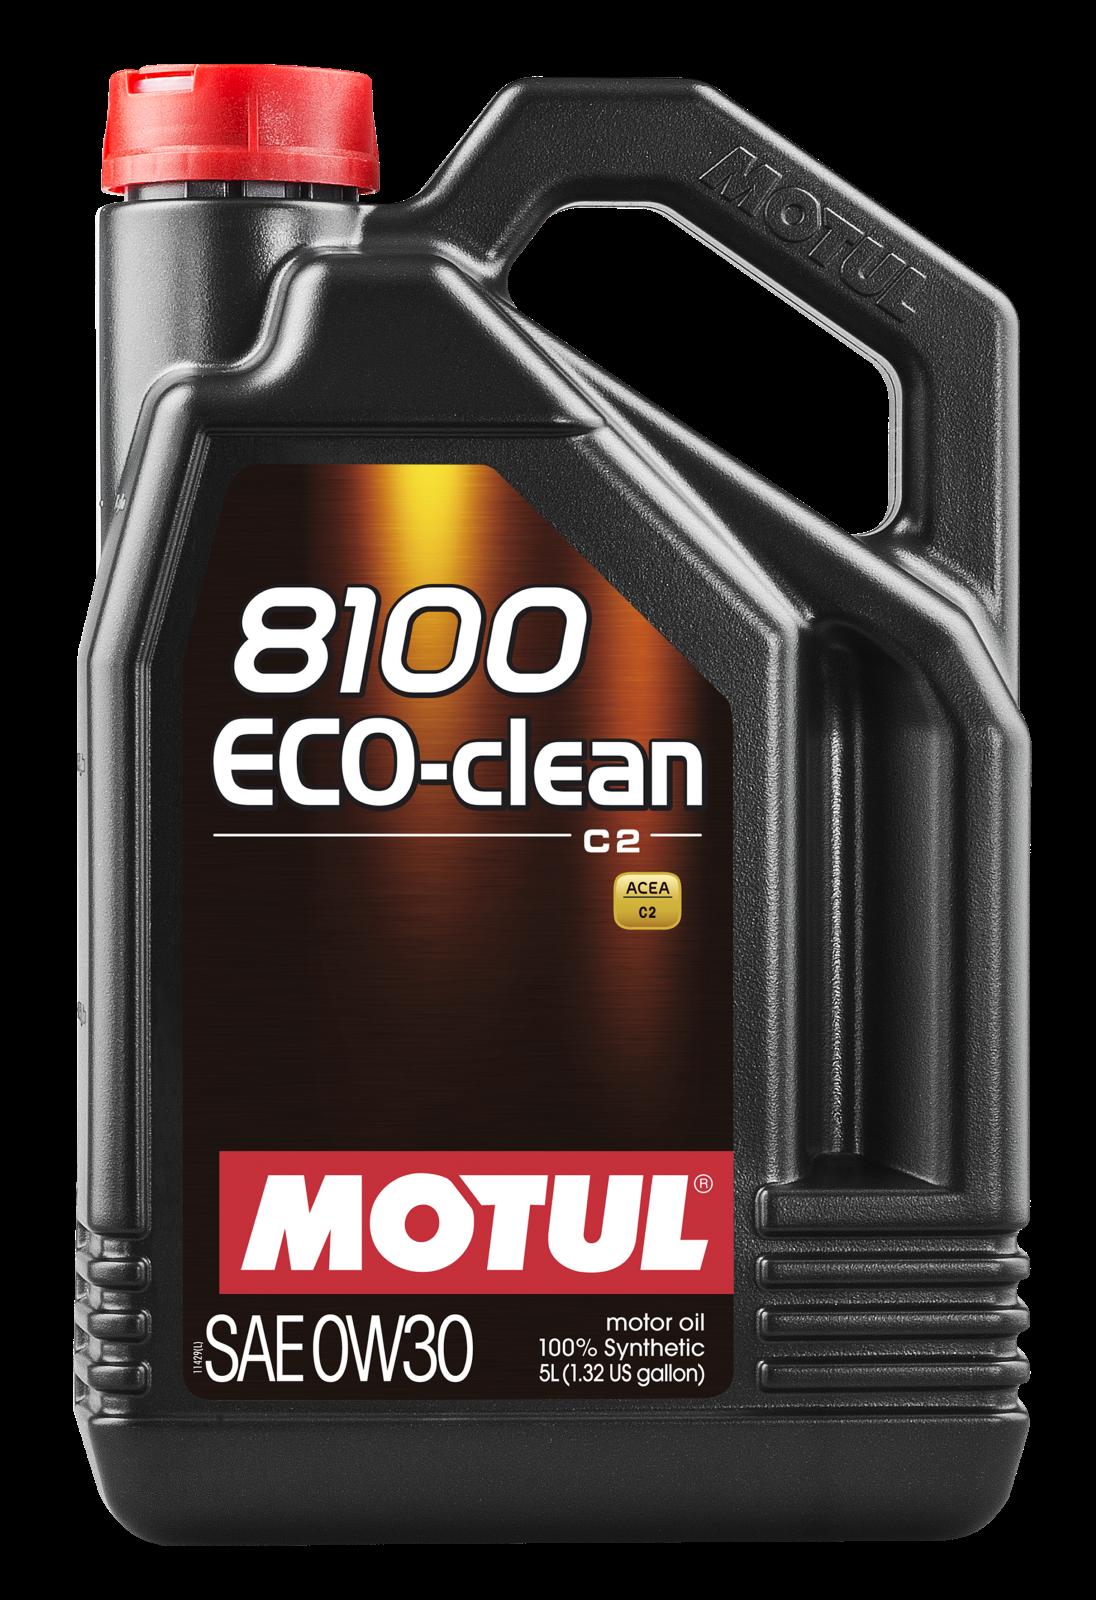 MOTUL AG MOTUL 8100 Eco-clean 0W-30 5L